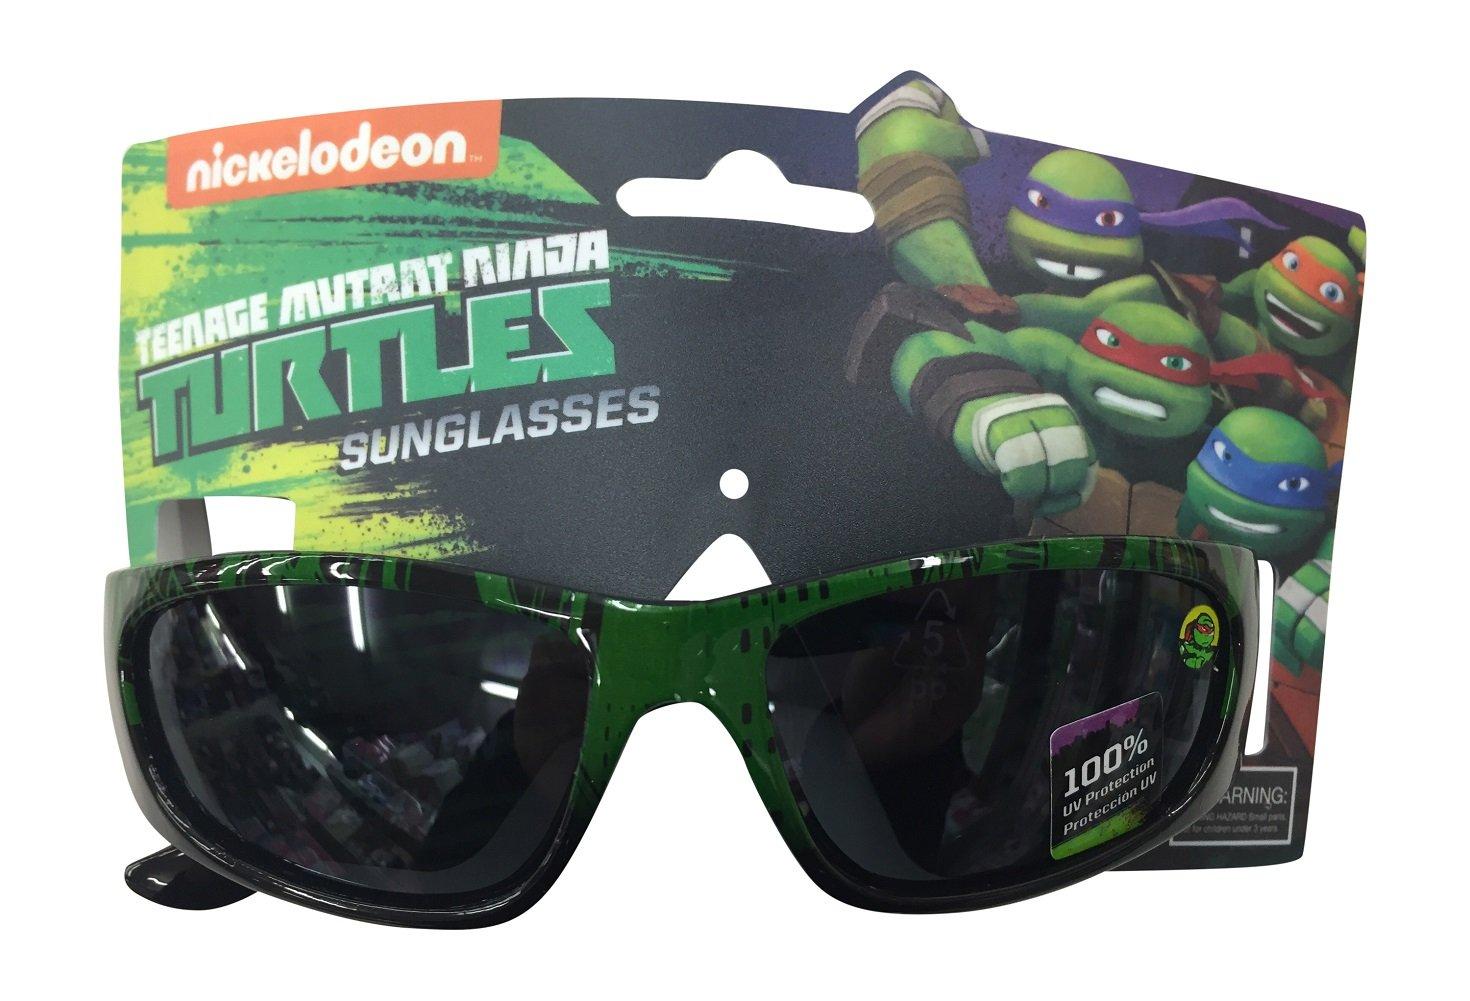 Nickelodeon Ninja Turtles Boys Green Team Sunglasses - 100% UVA & UVB Protection